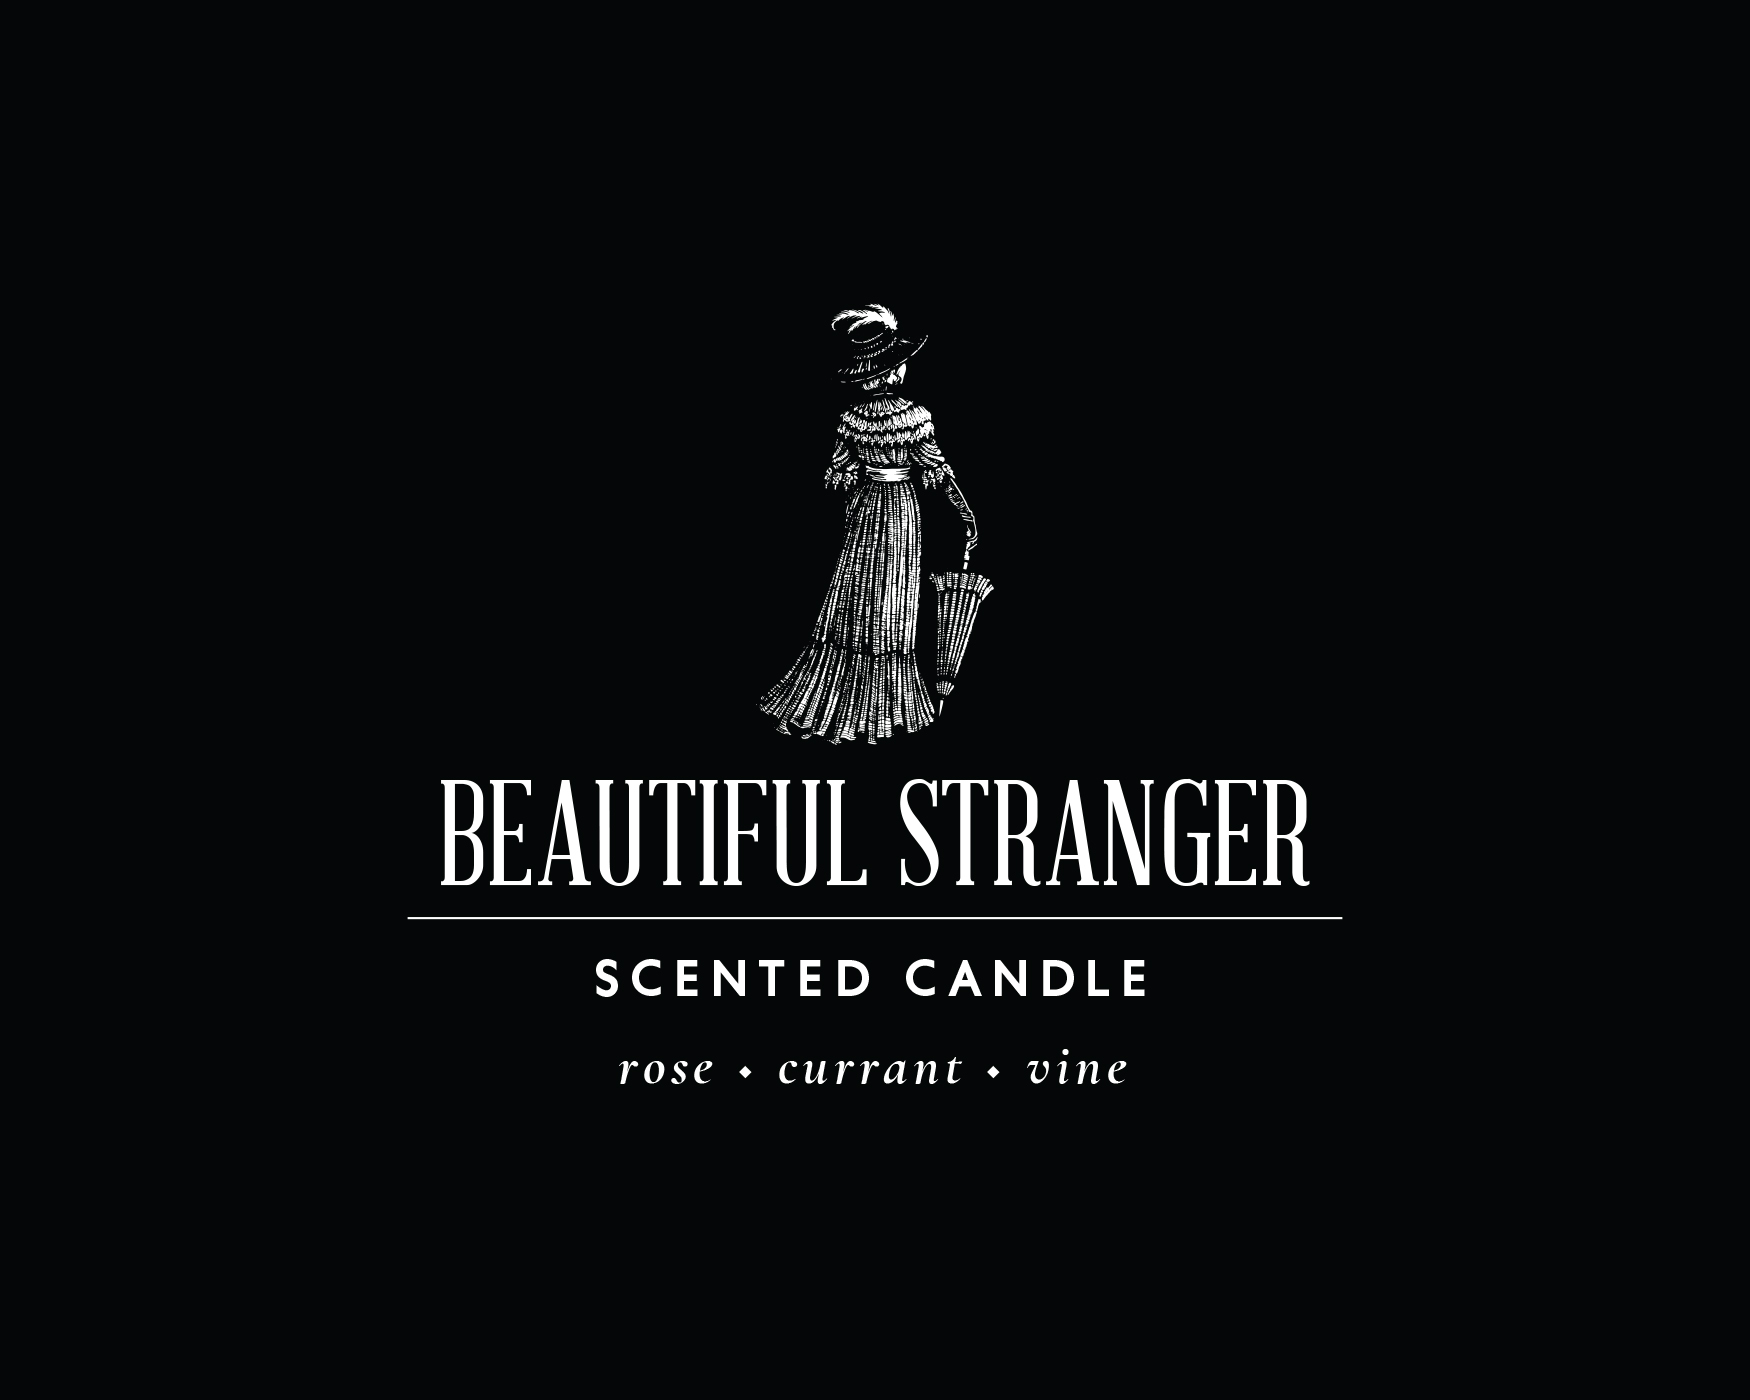 Candle_BeautifulStranger_Design1.jpg